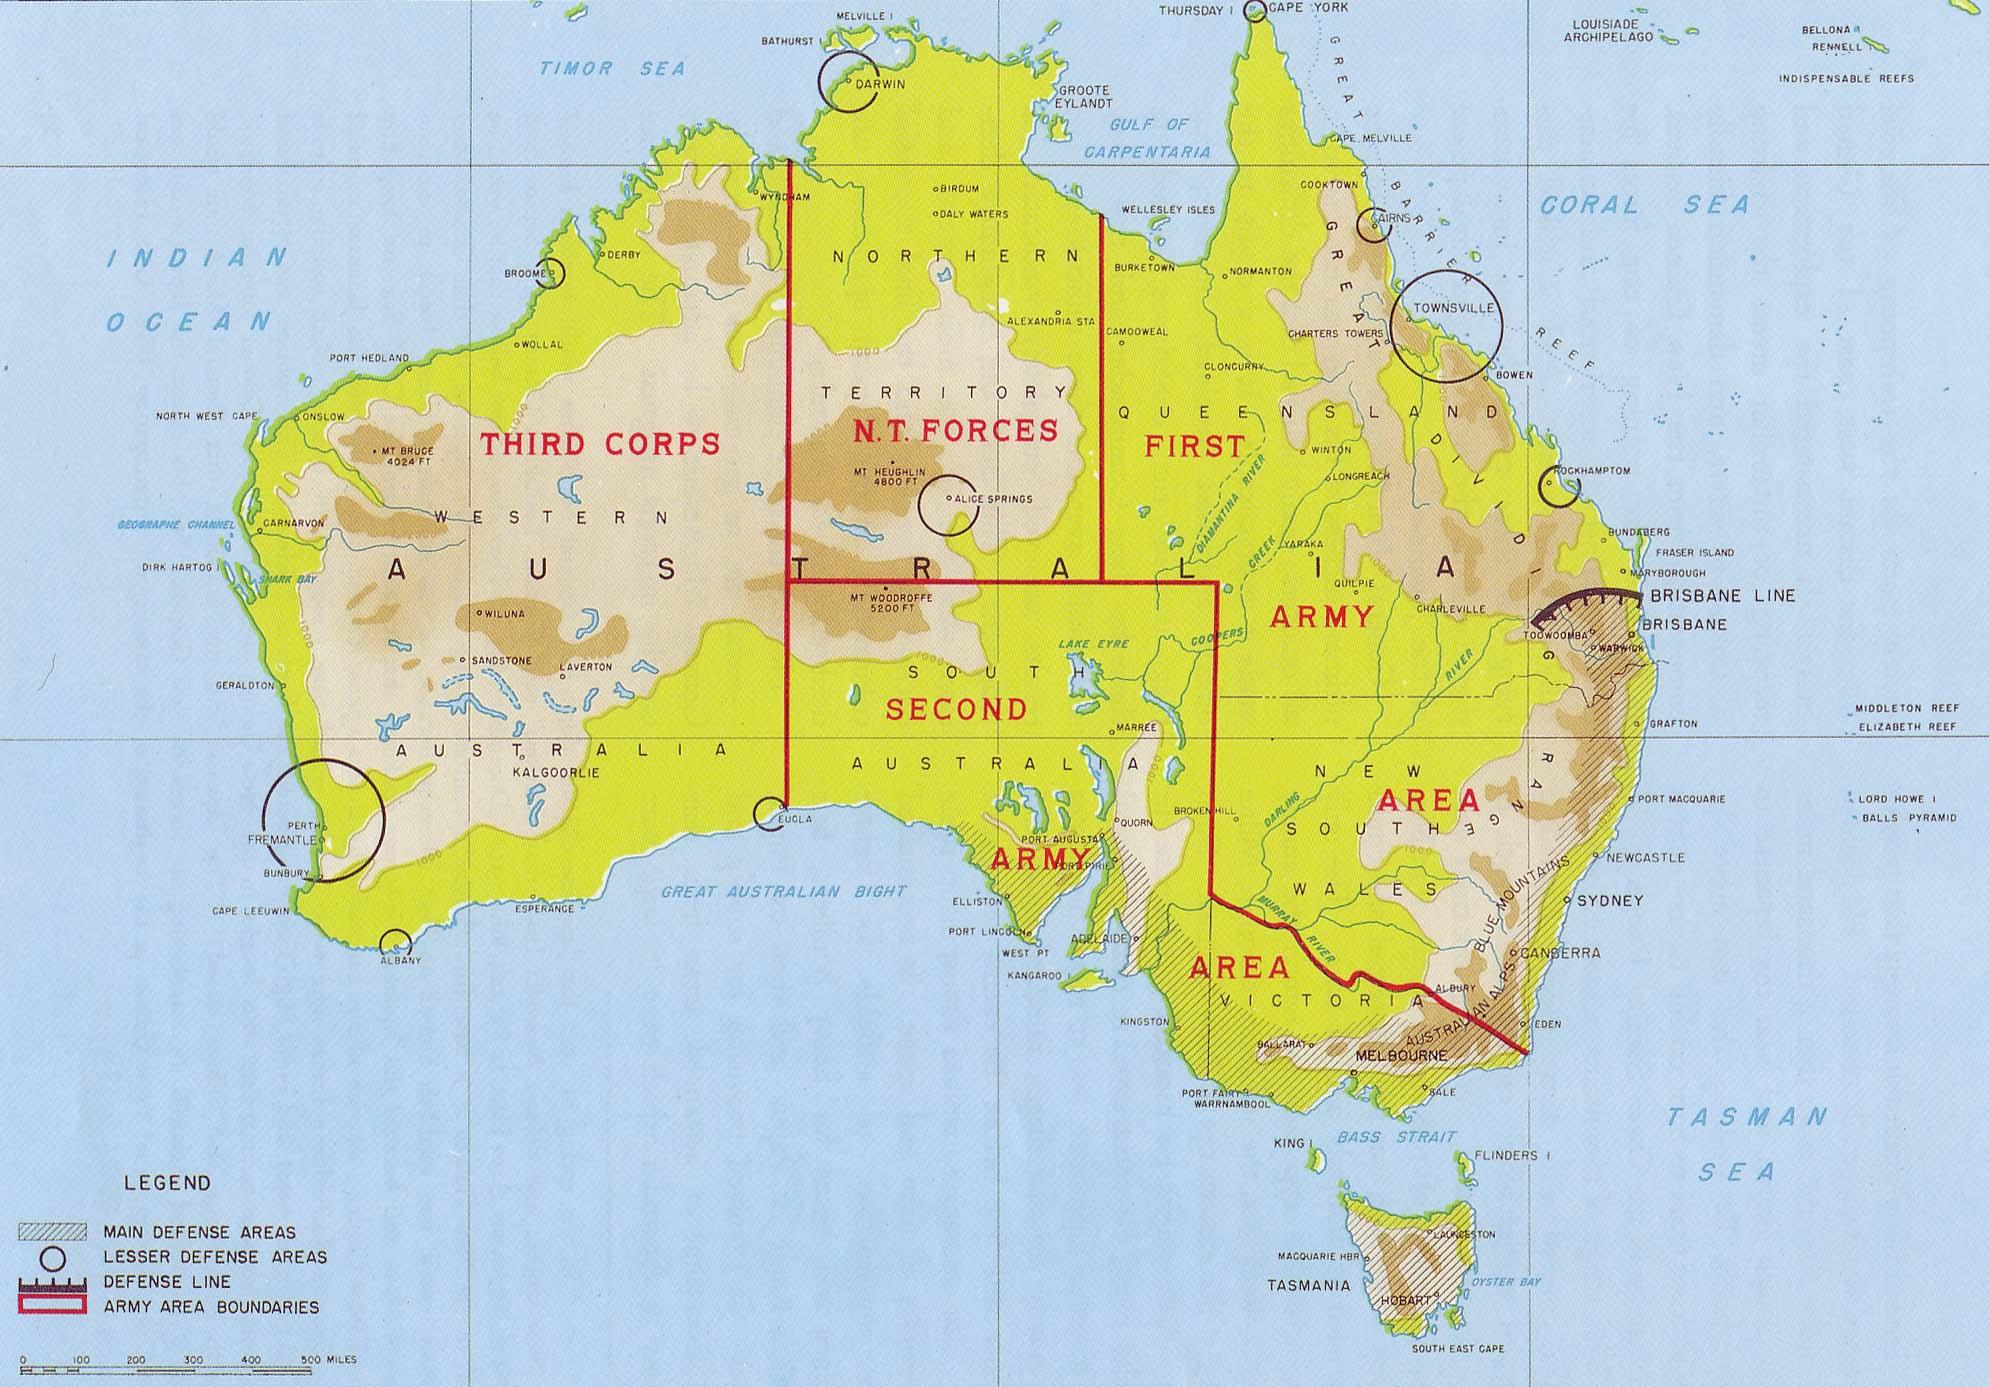 Brisbane Line - Wikipedia